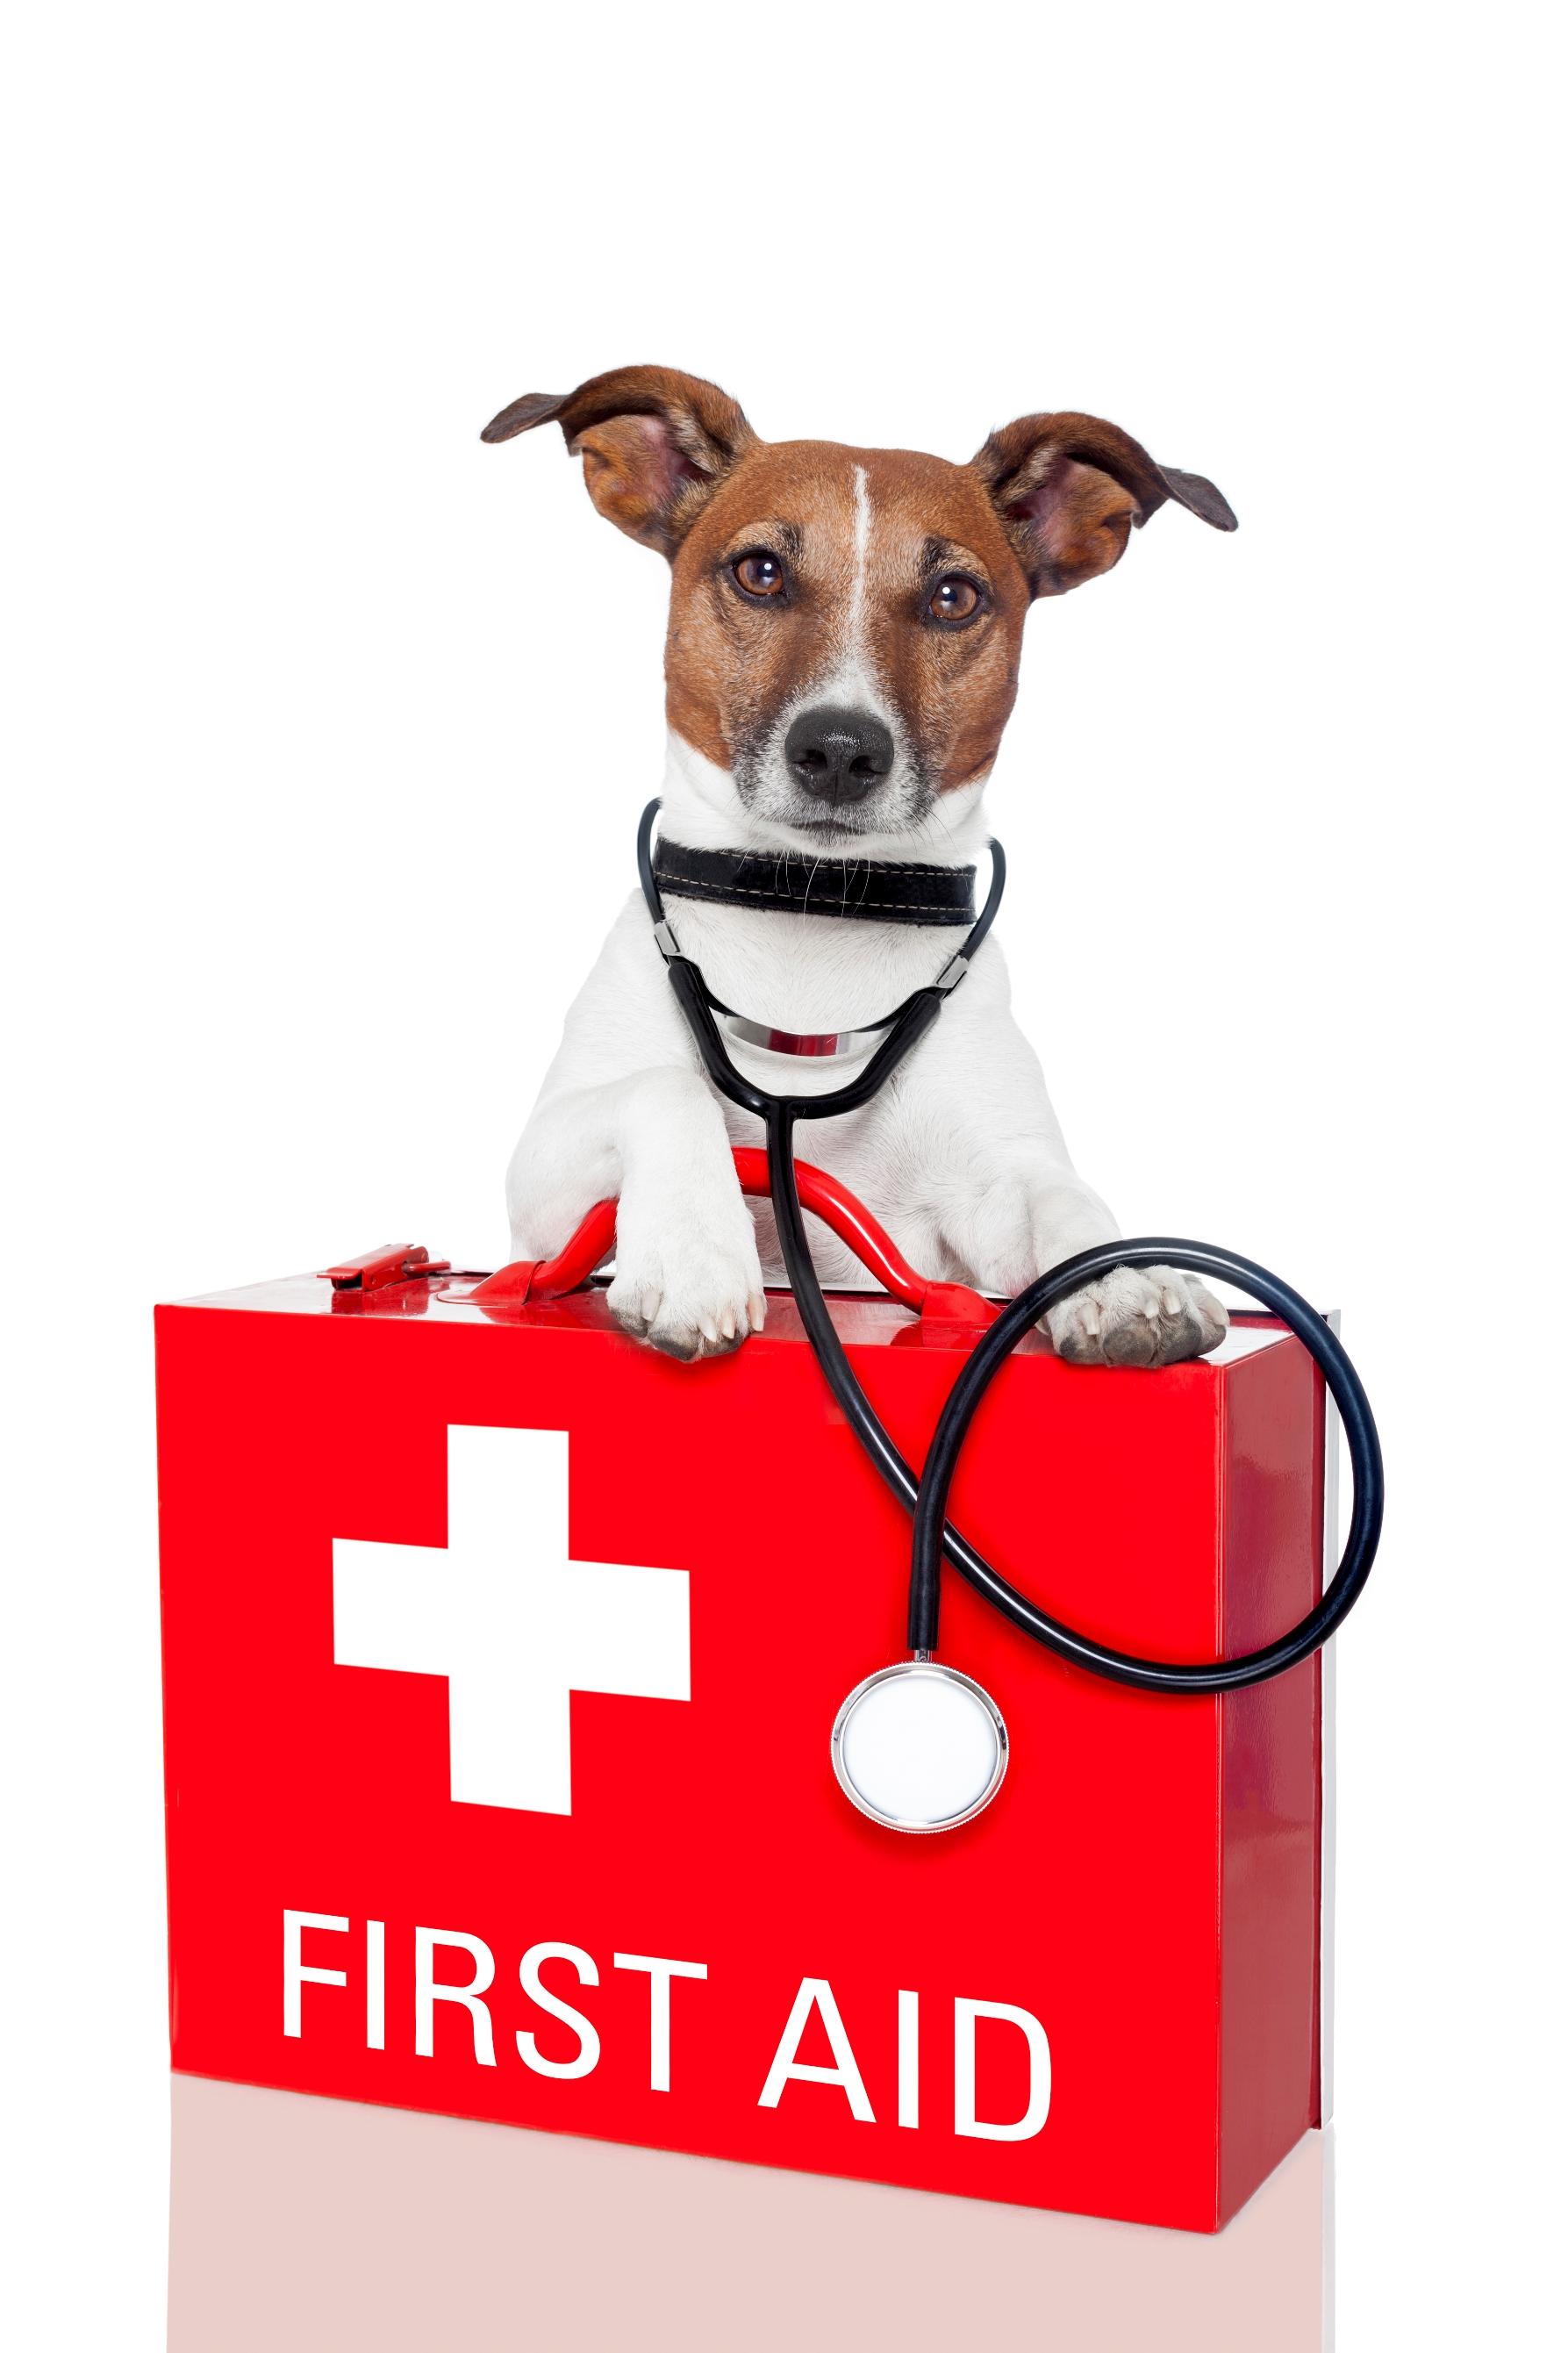 emergenze clinica ippodromo merano